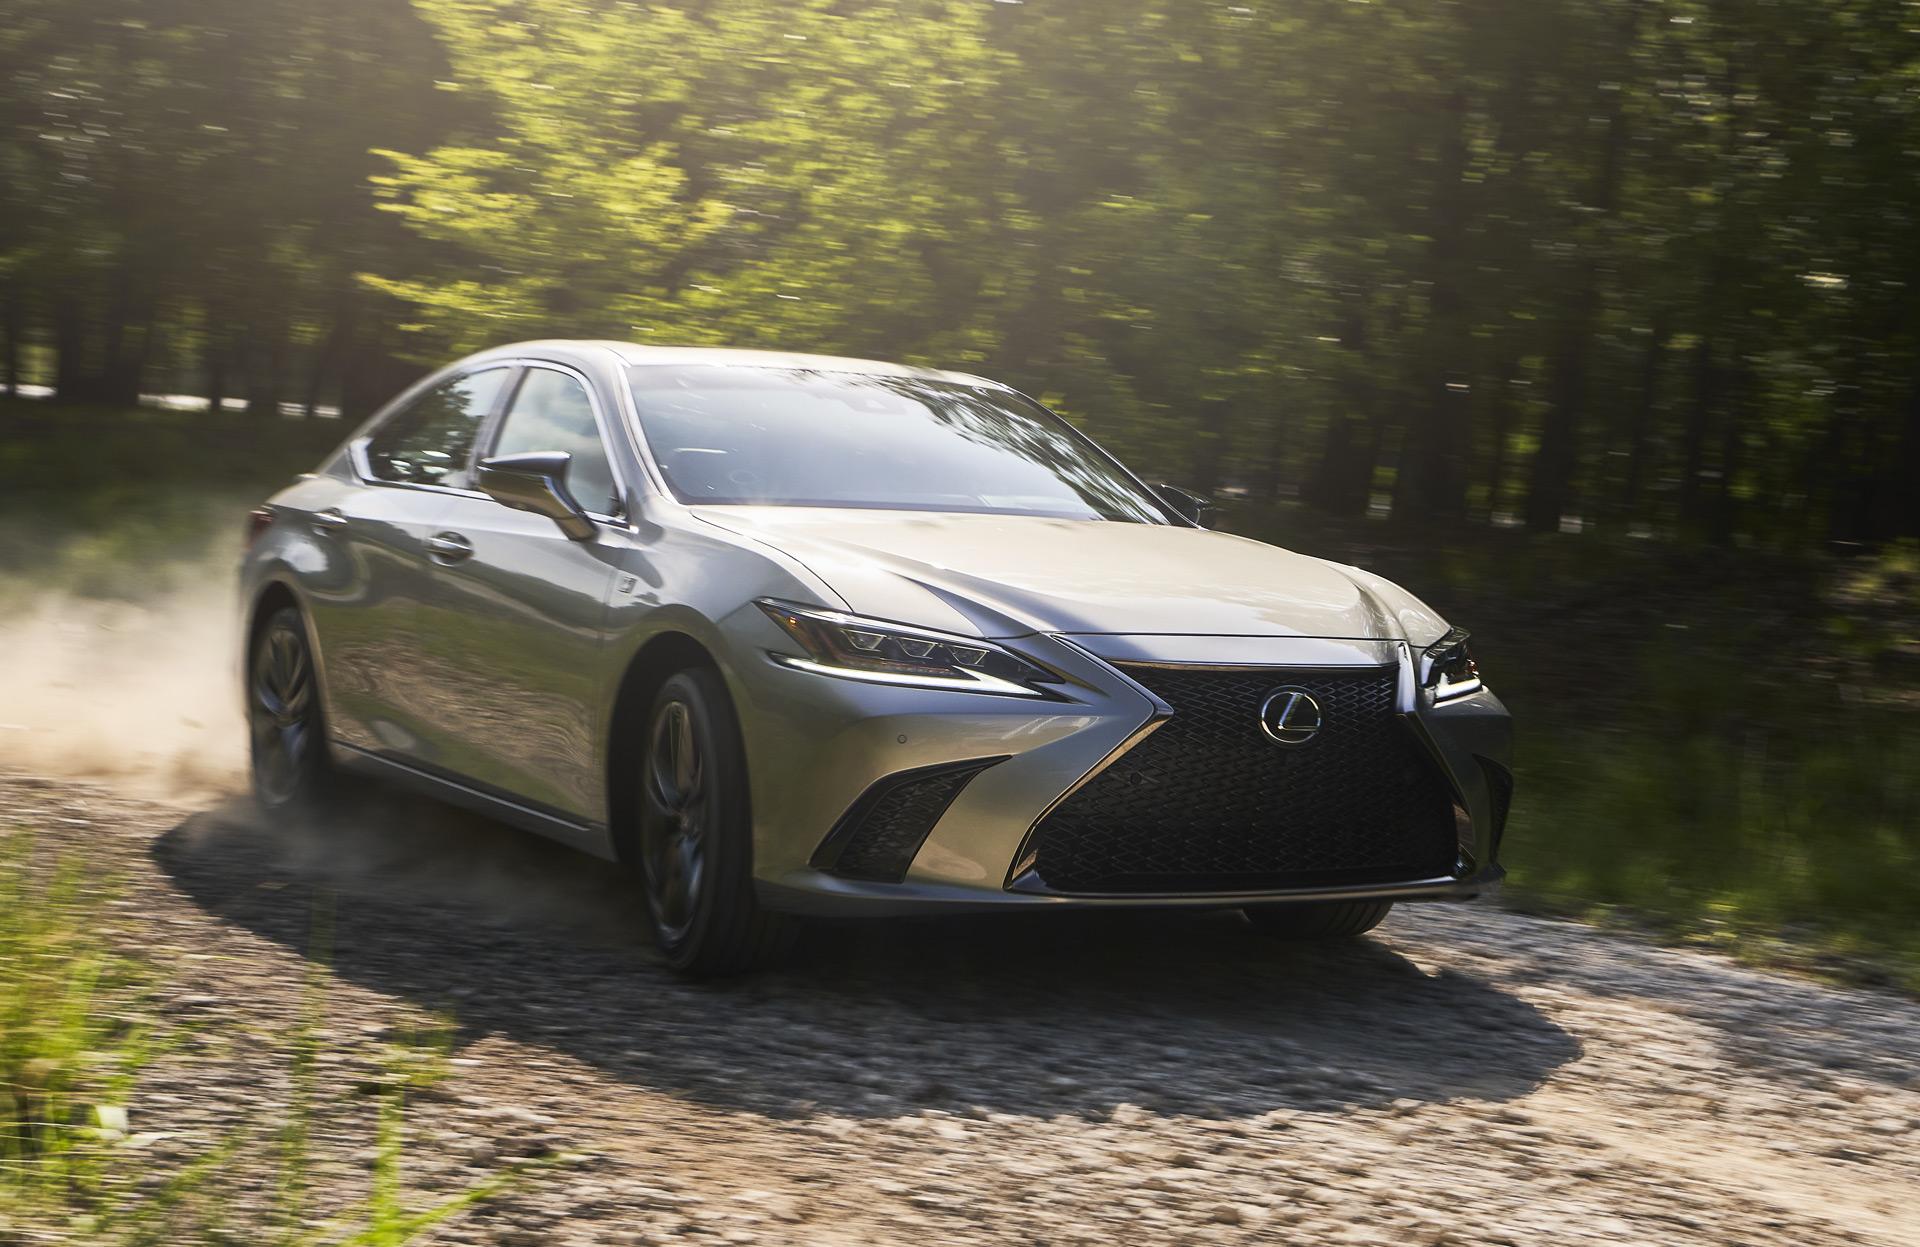 2021 Lexus ES 350 Specs and Review